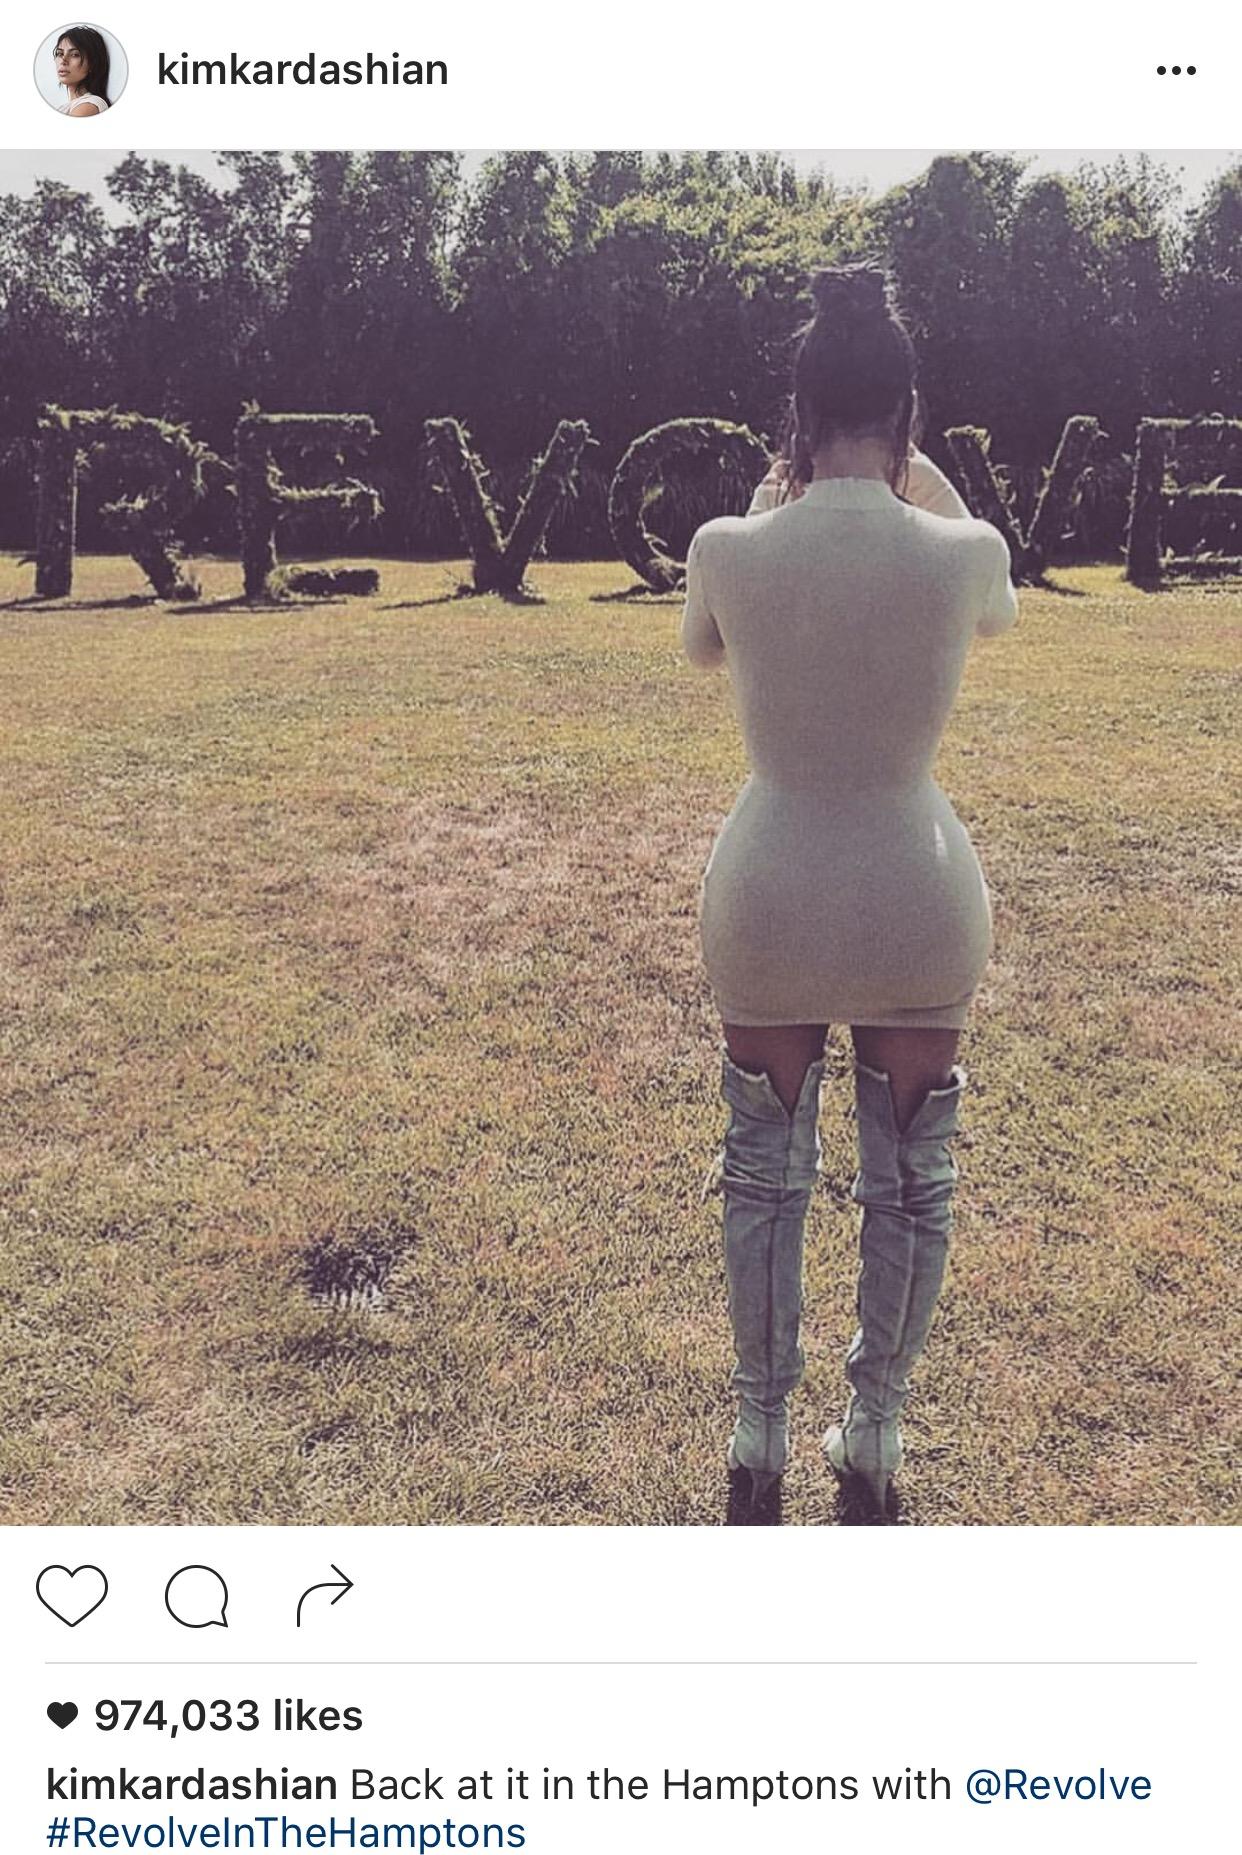 Photo courtesy of Kim Kardashian via Instagram